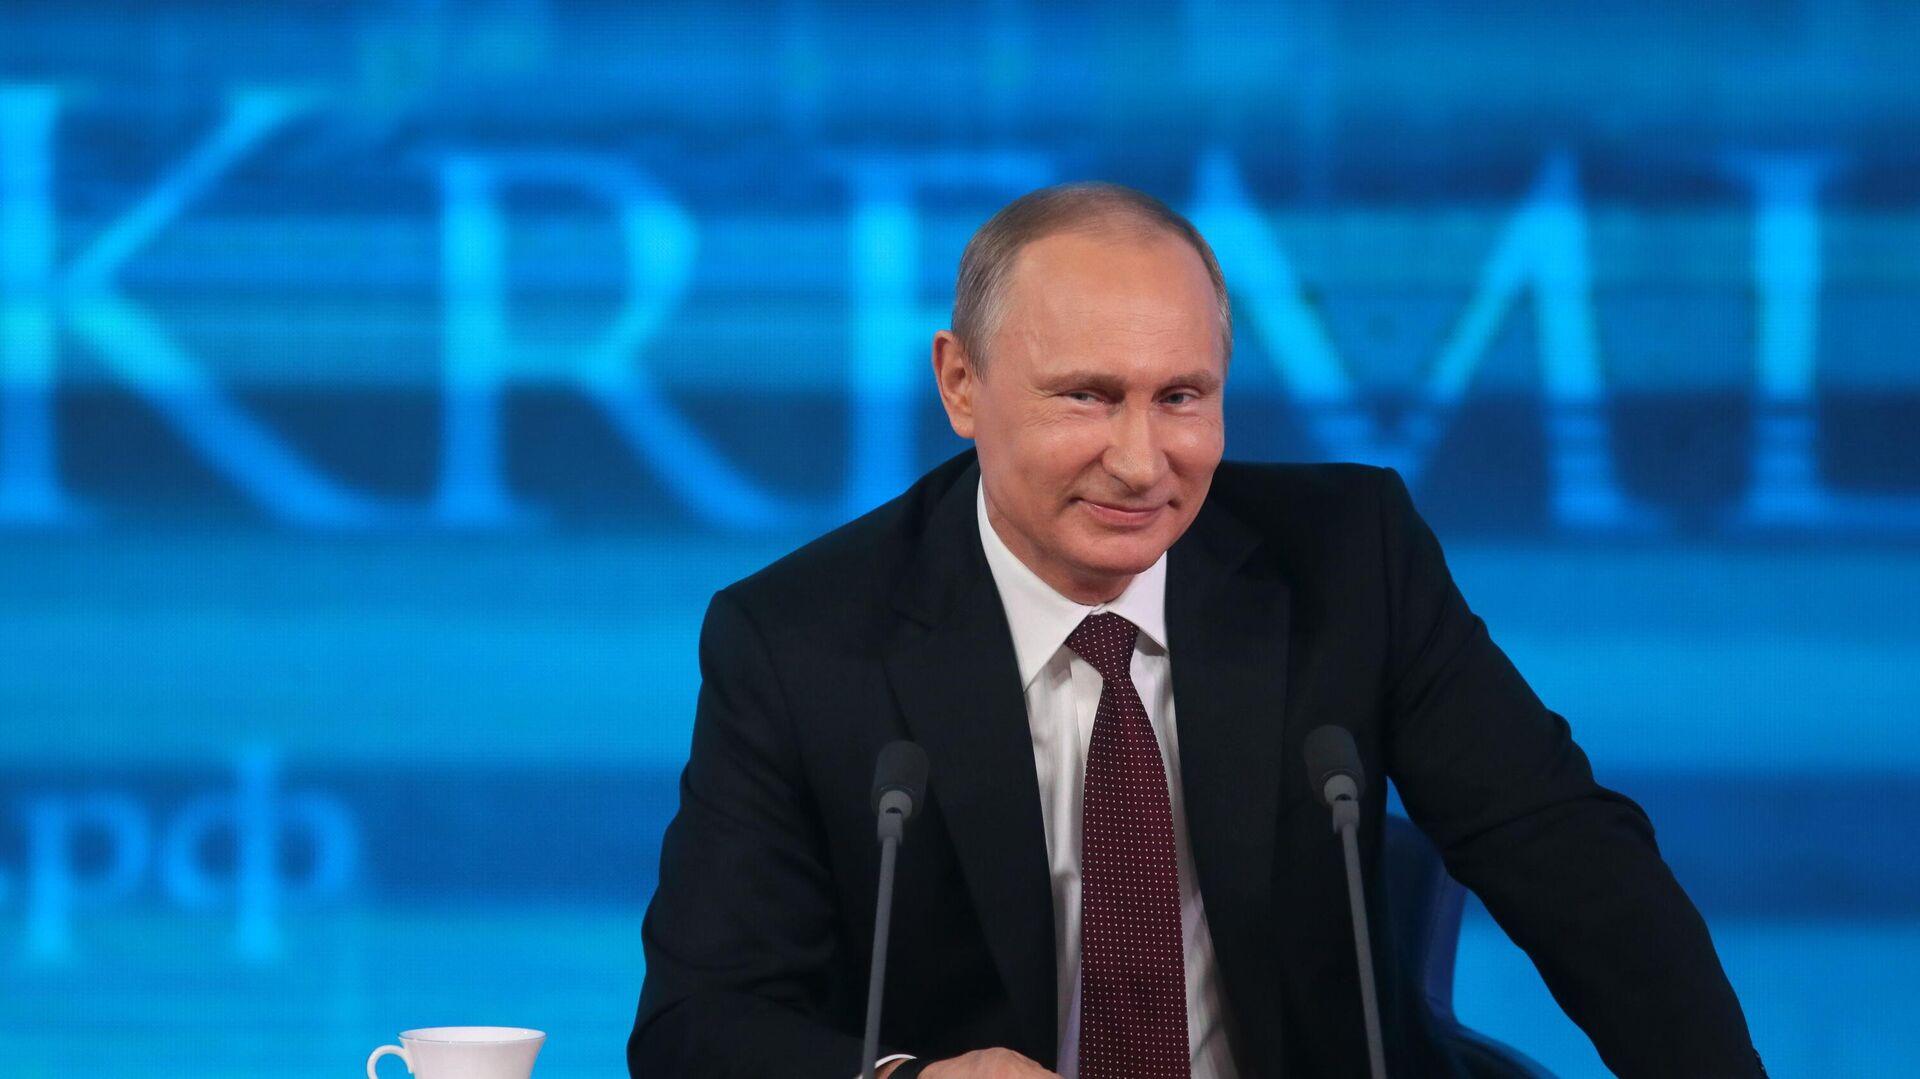 Президент России Владимир Путин - Sputnik Таджикистан, 1920, 17.09.2021